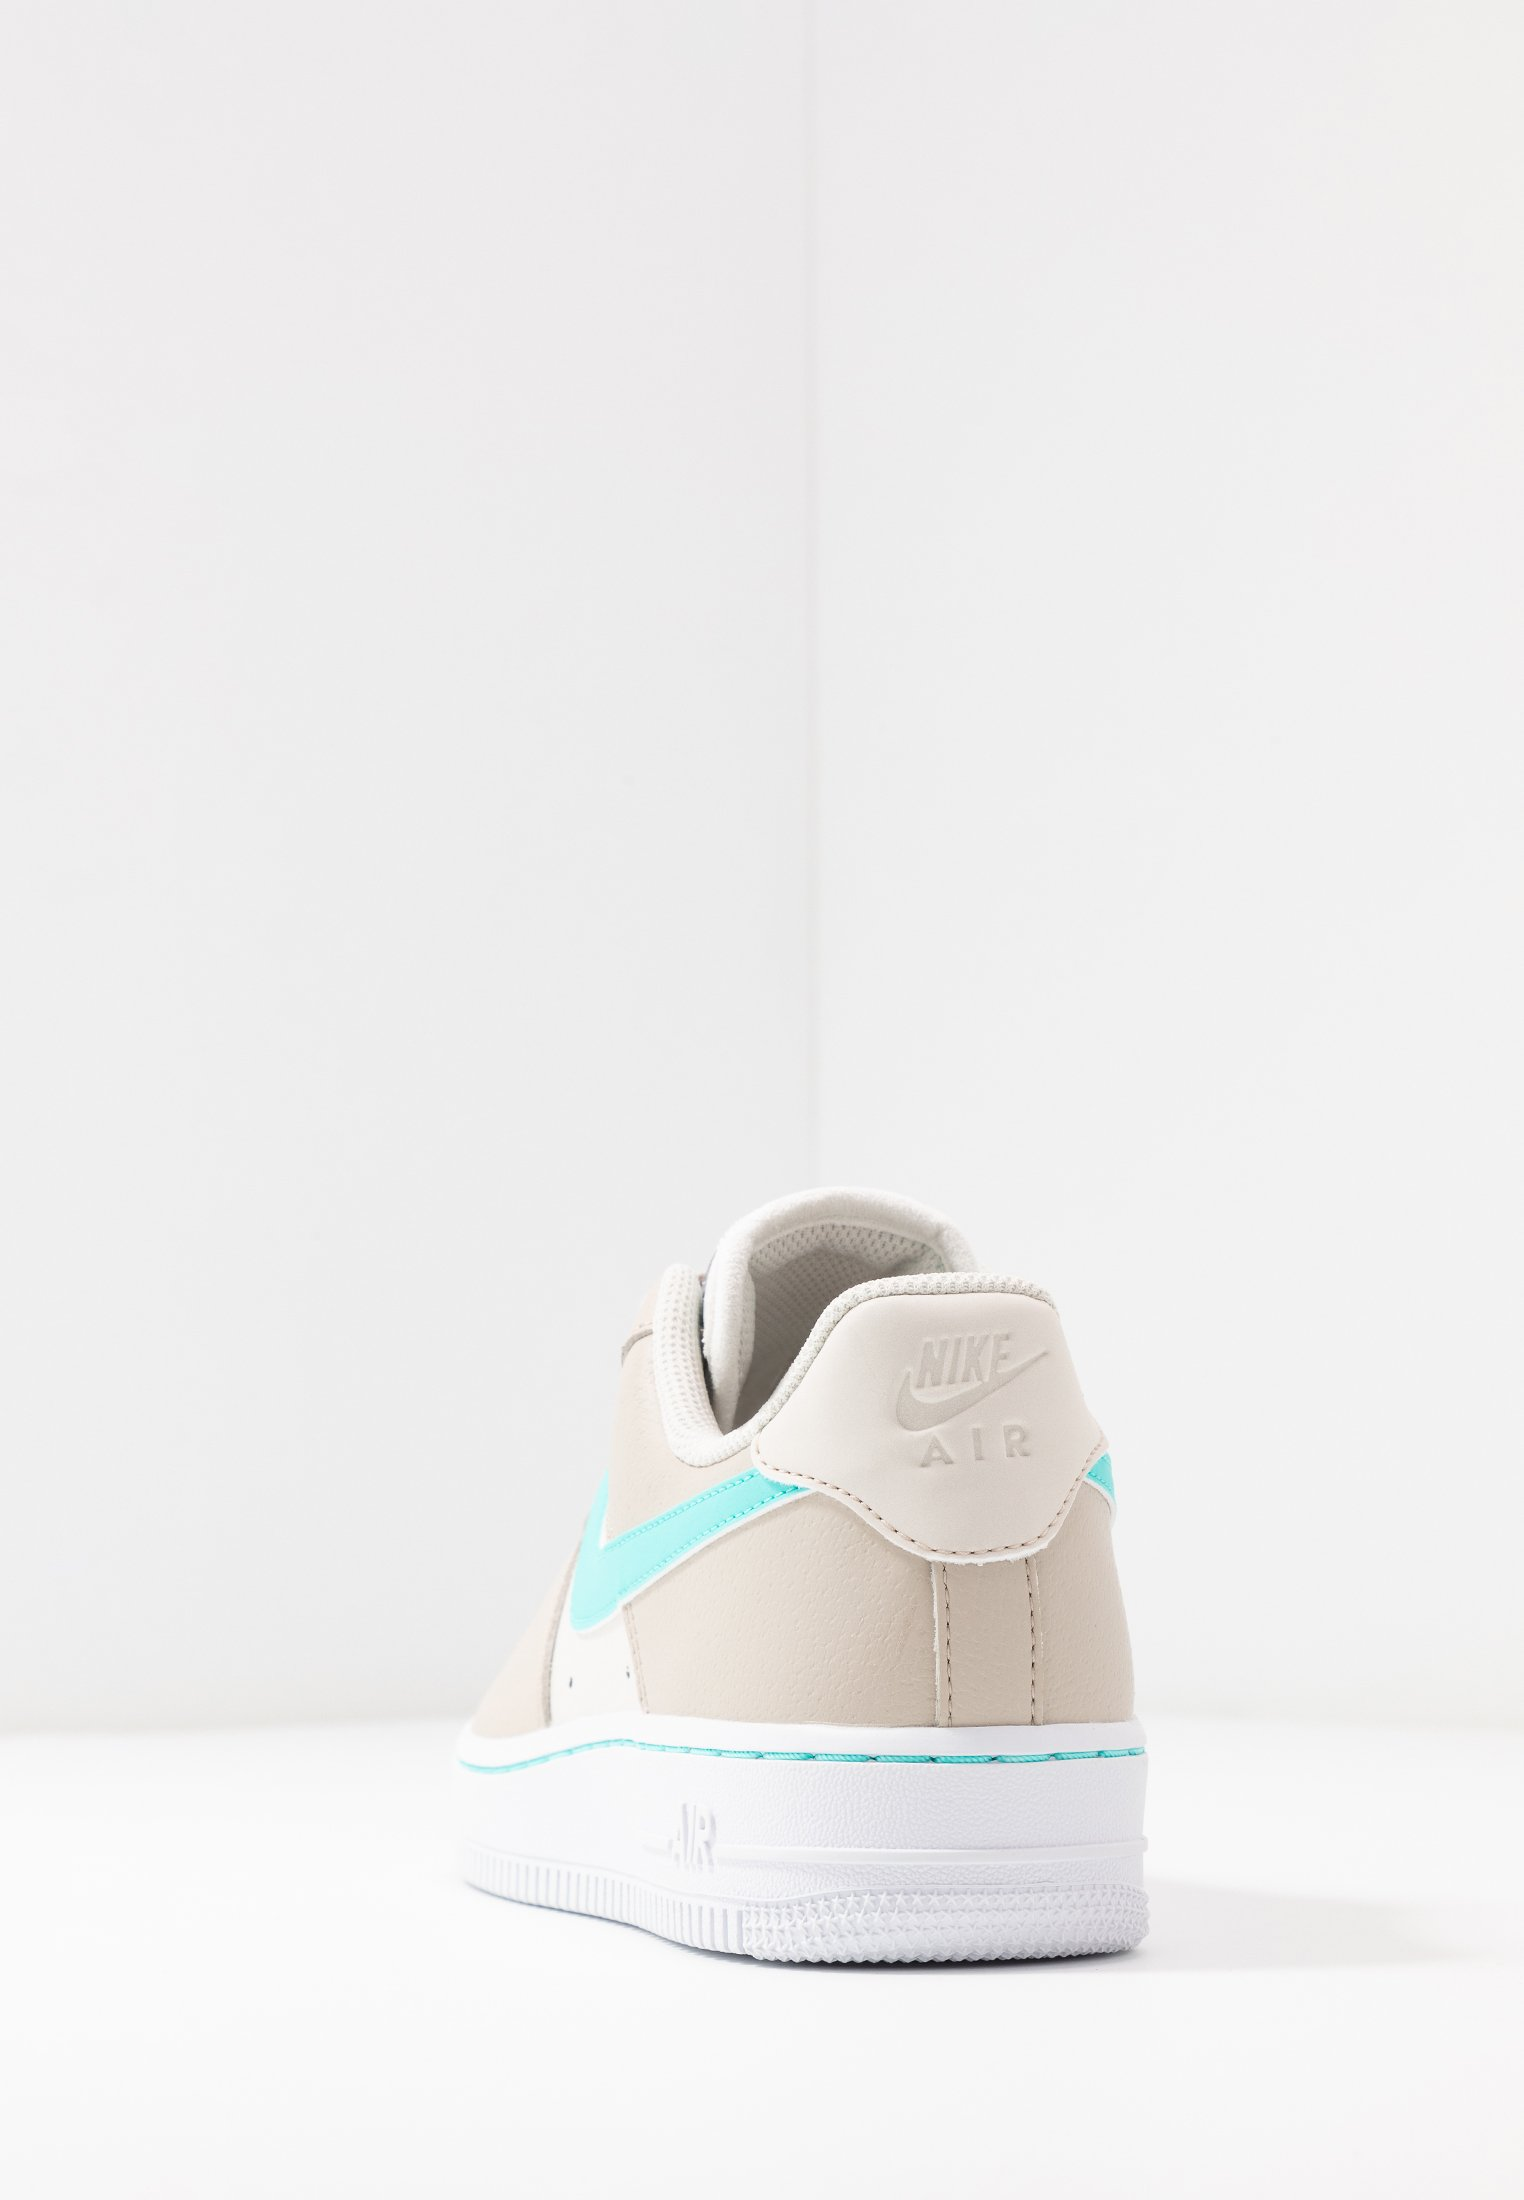 Nike Air Force 1 Low DESERT SANDAURORA GREEN PHANTOM